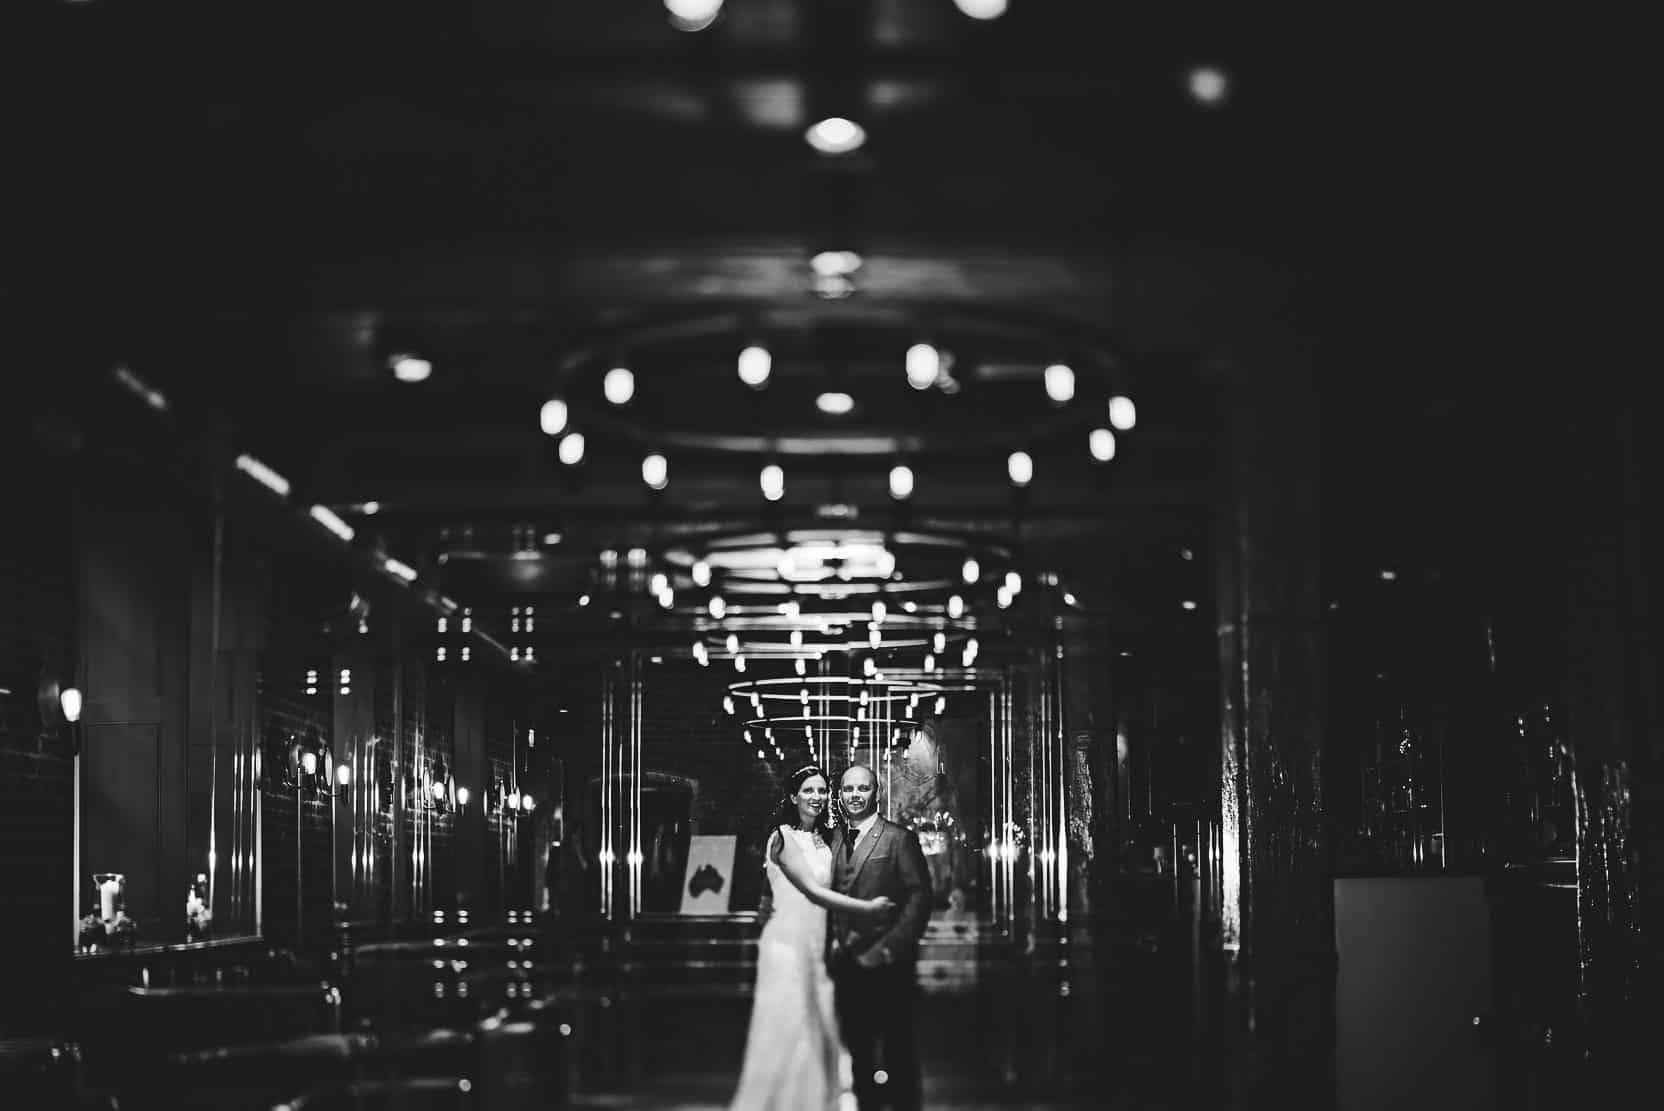 wedding_photography_asia_house_london_ld_justin_bailey_photography_015